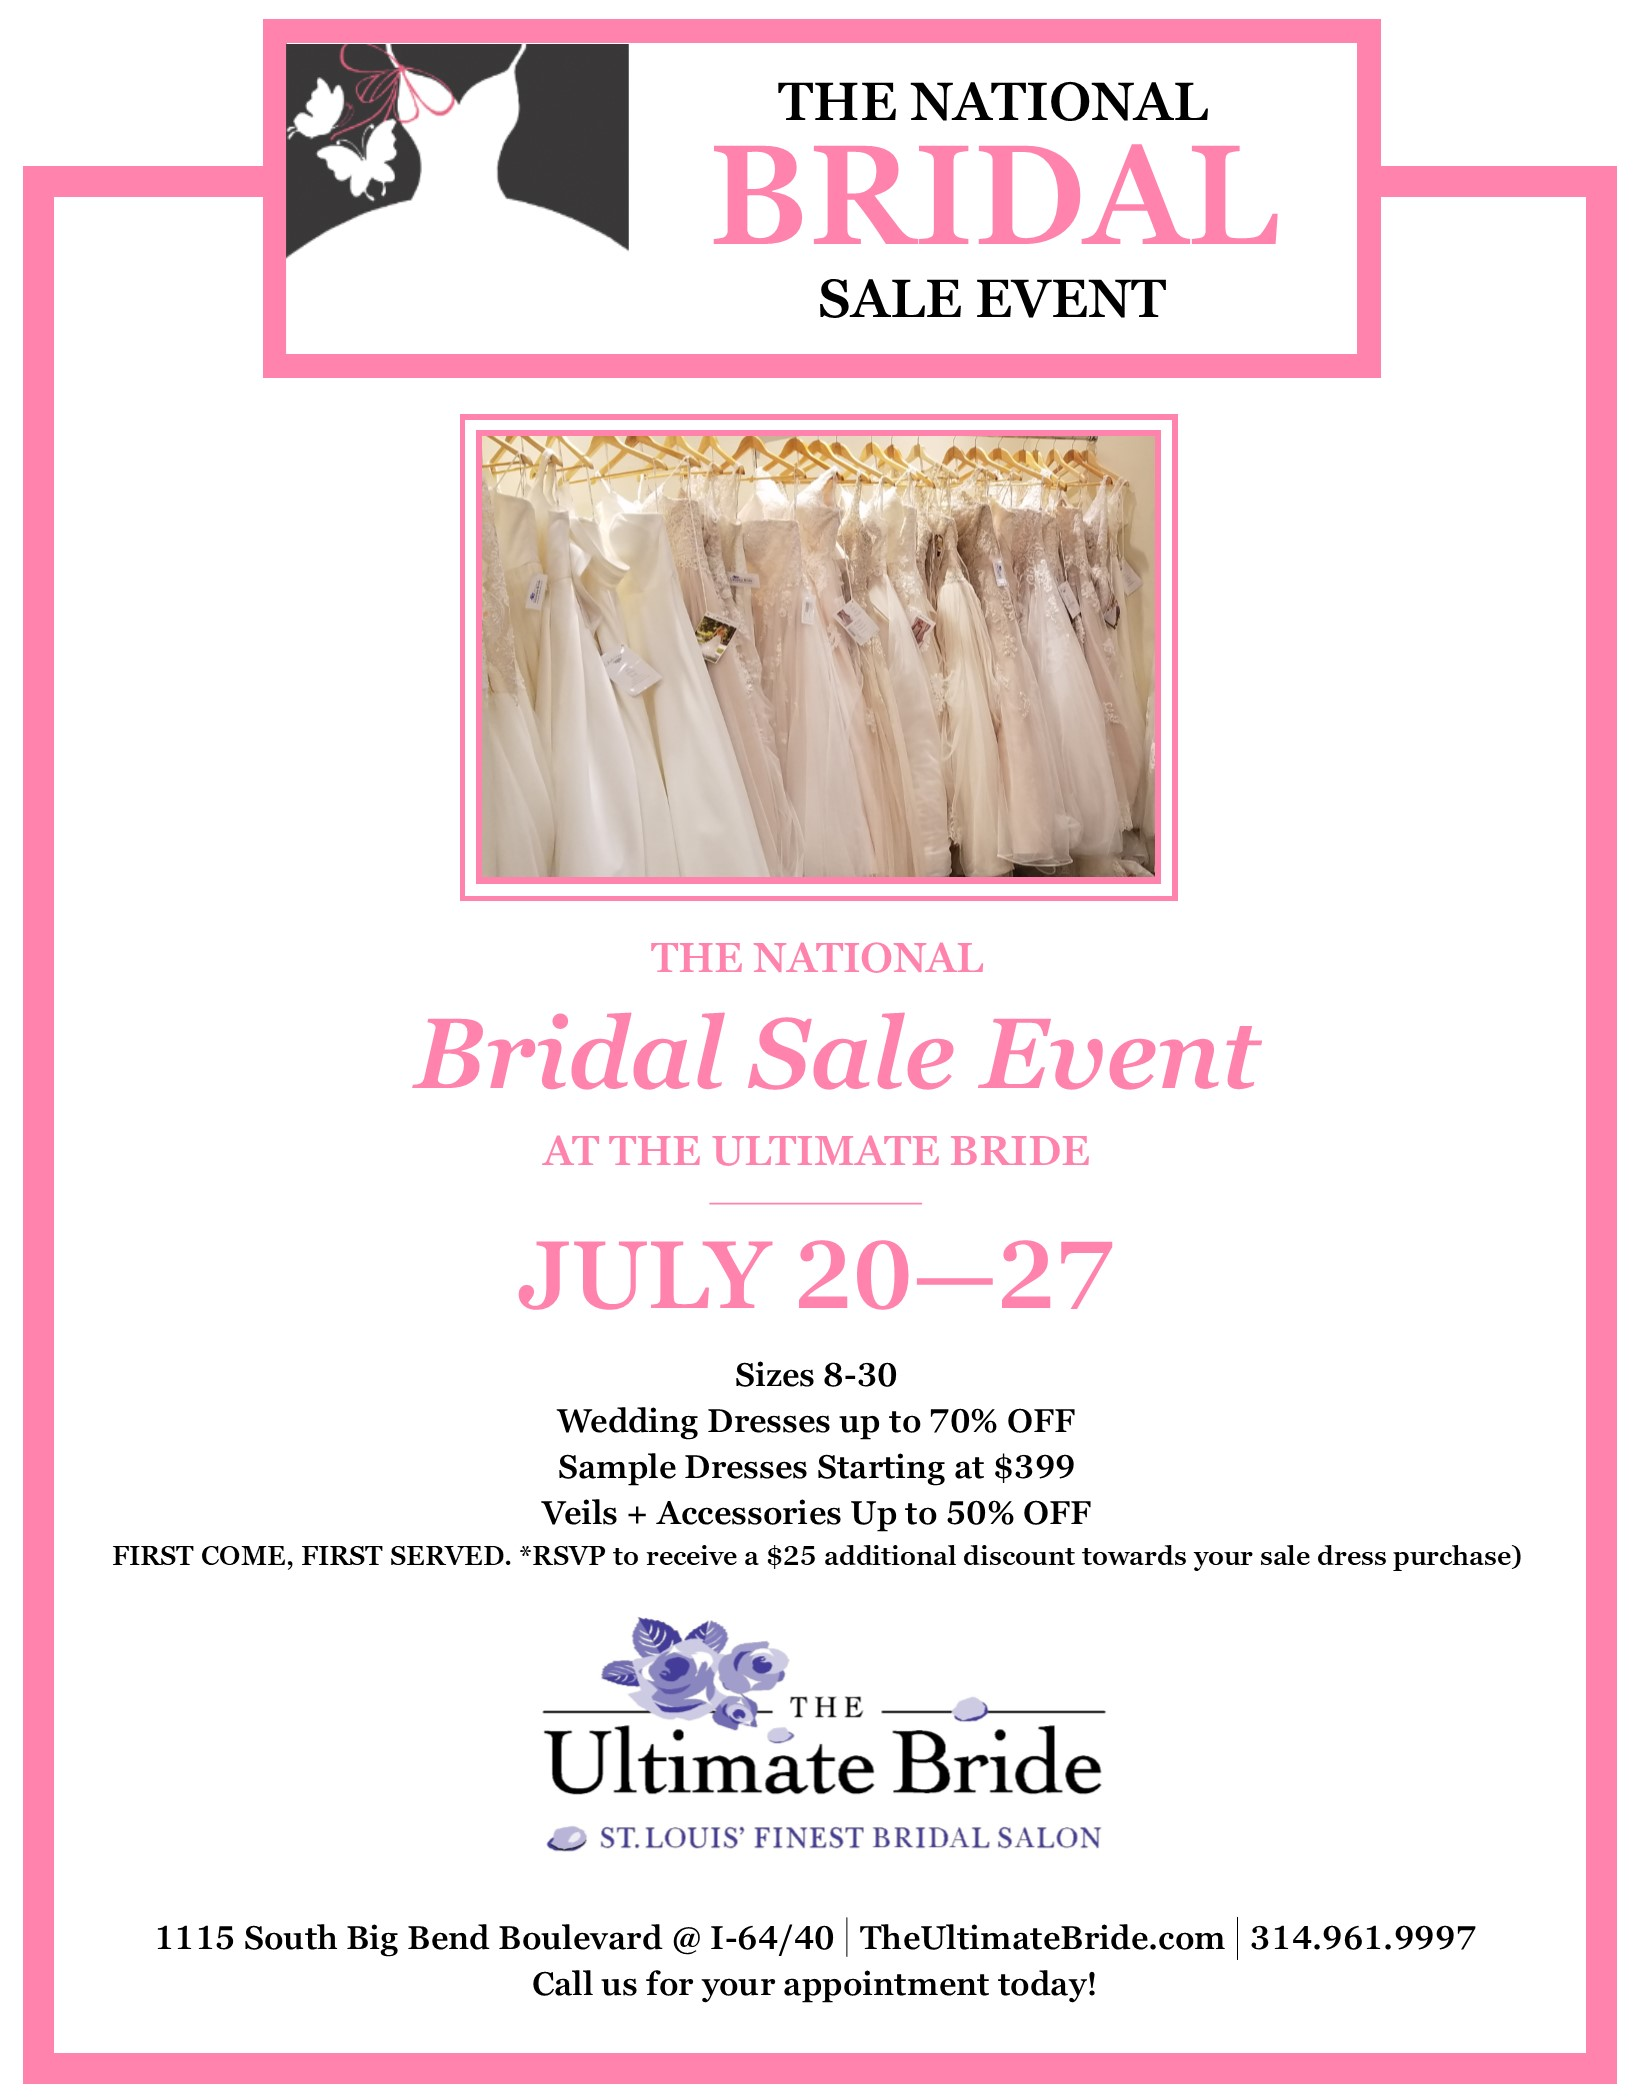 UB_Bridal_Event_July.jpg